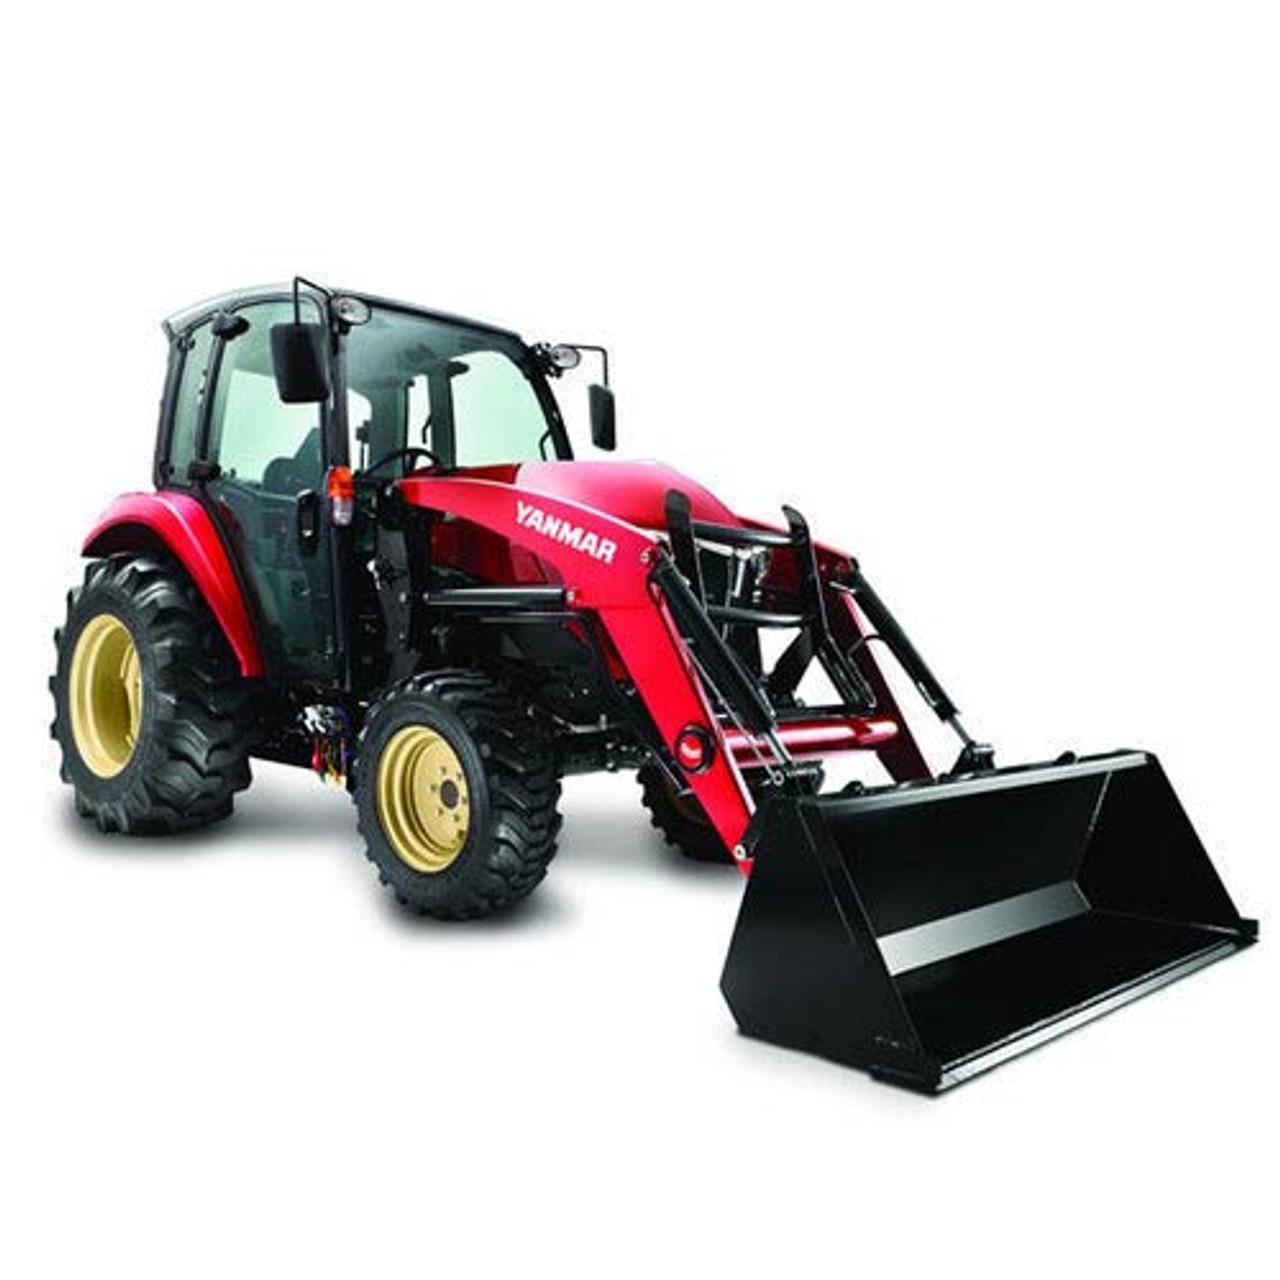 Yanmar Tractor Battery : Yanmar yt series tractor c holmes rental station